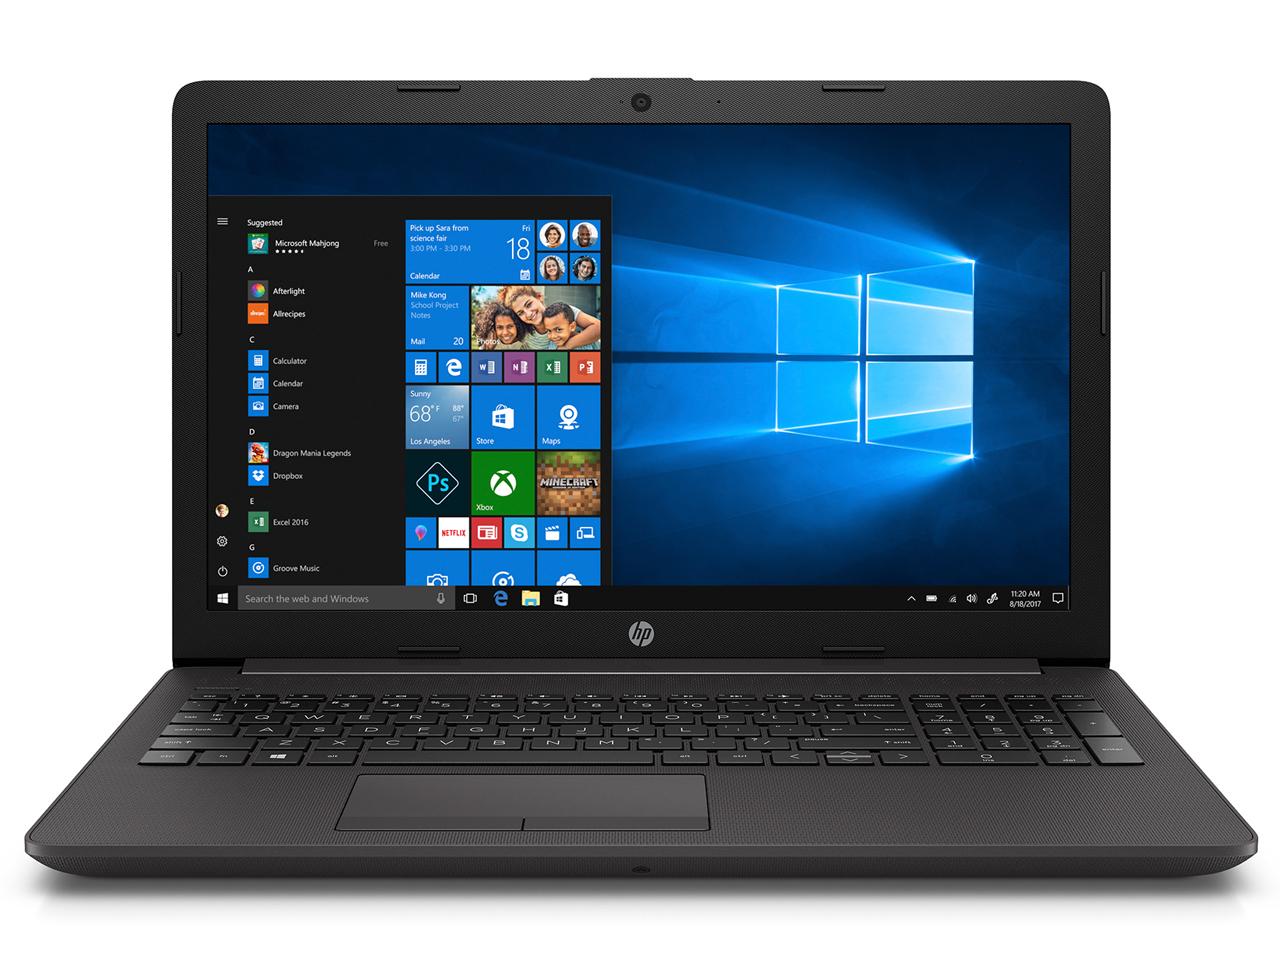 ★HP 250 G7 5KX40AV-AJJO (15.6インチ / Windows 10 Home / Corei3-7020U 2.30GHz / 4GB / 500GB / DVDライター)